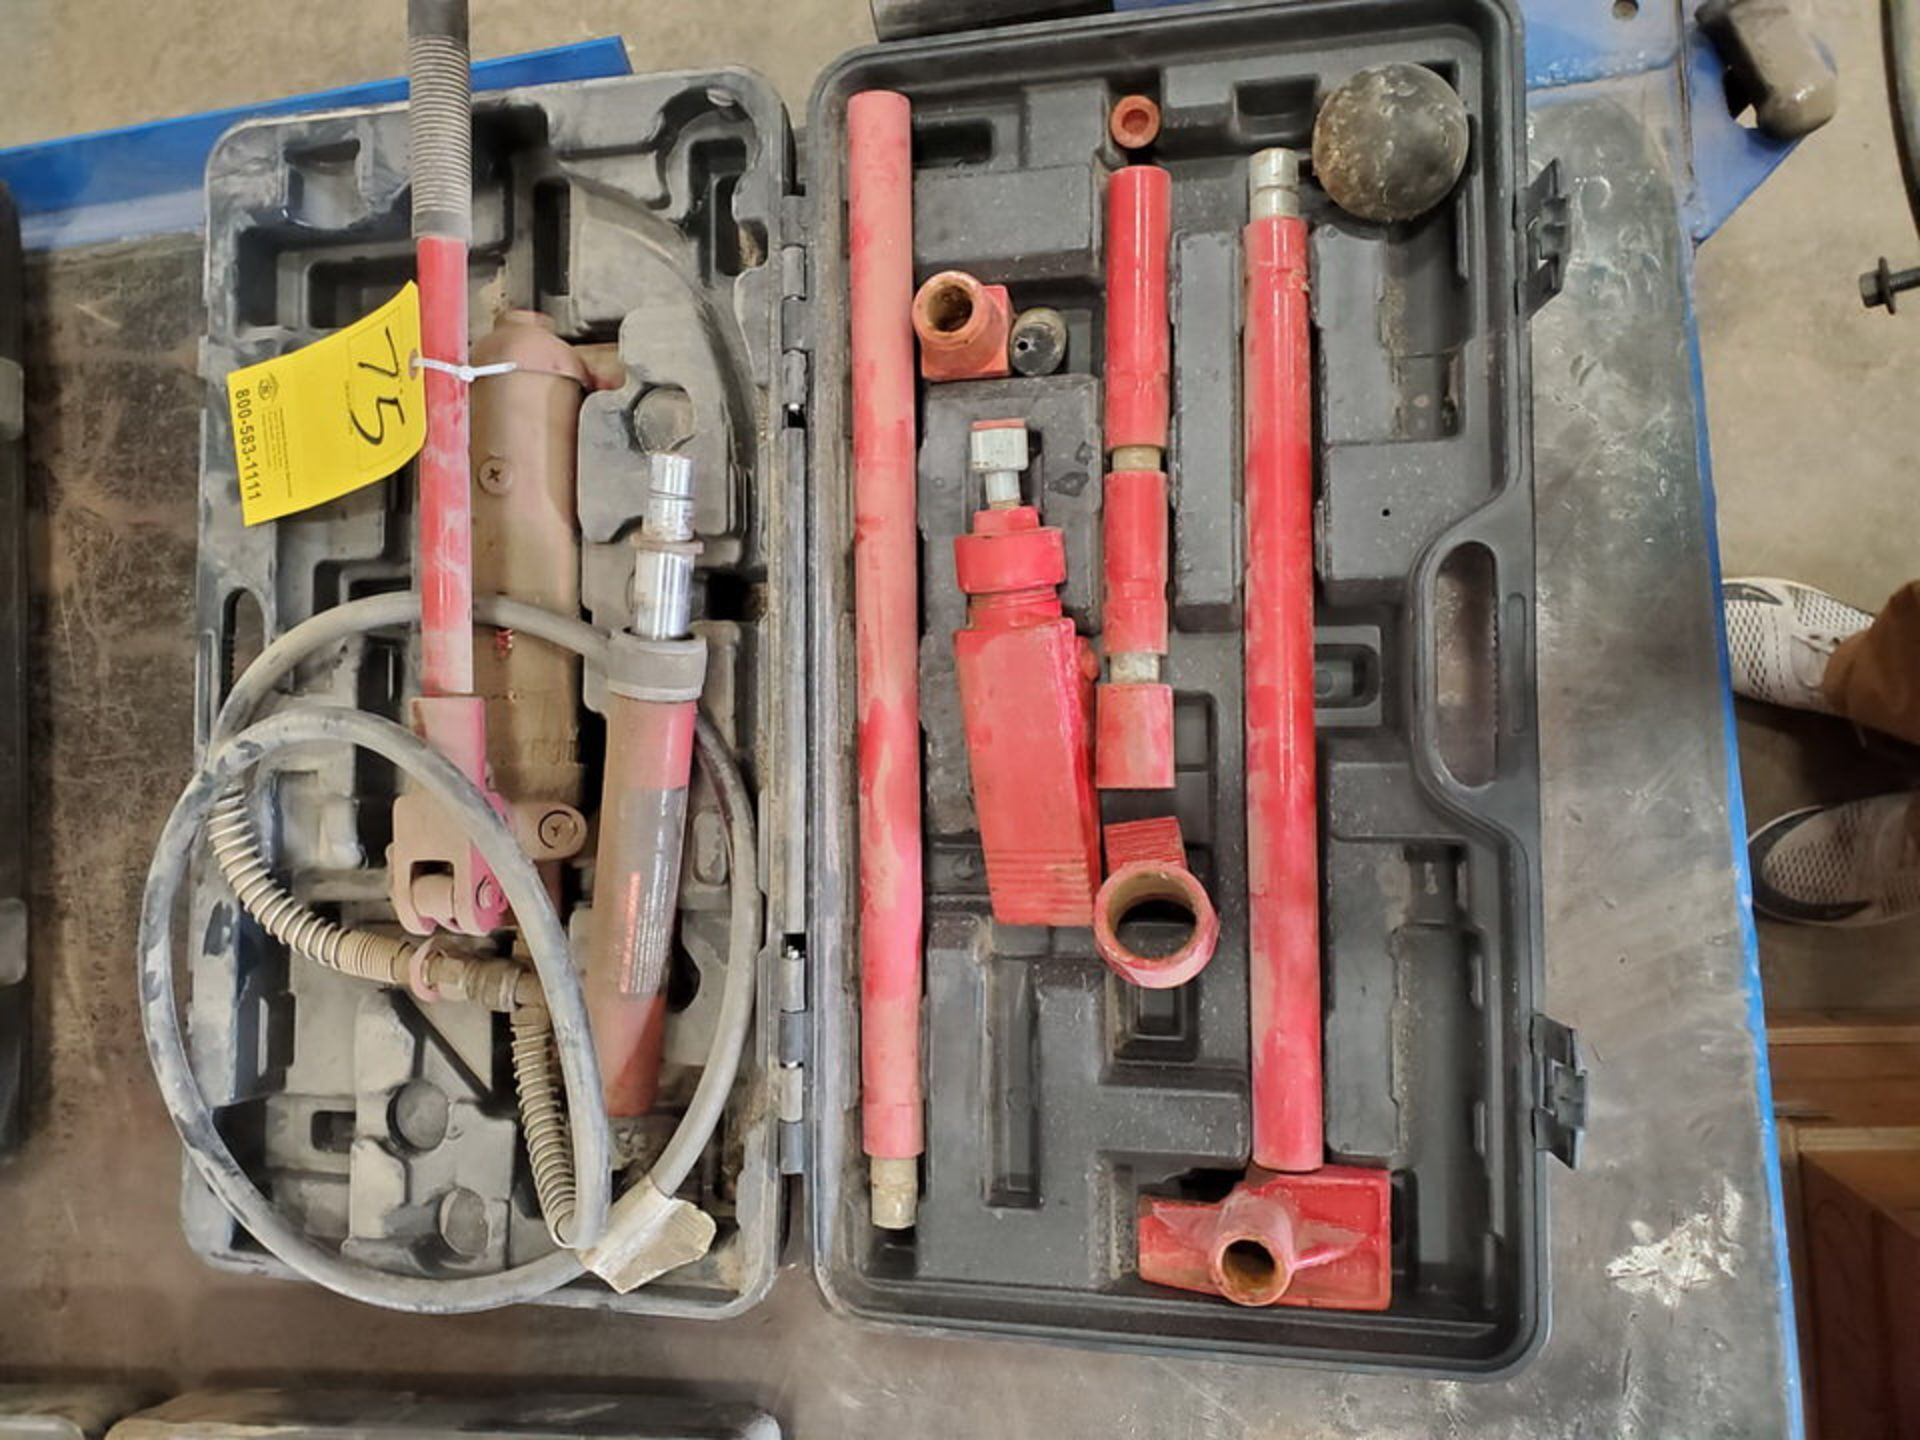 Proto 4 Ton Hydraulic Body Repair Kit - Image 5 of 5